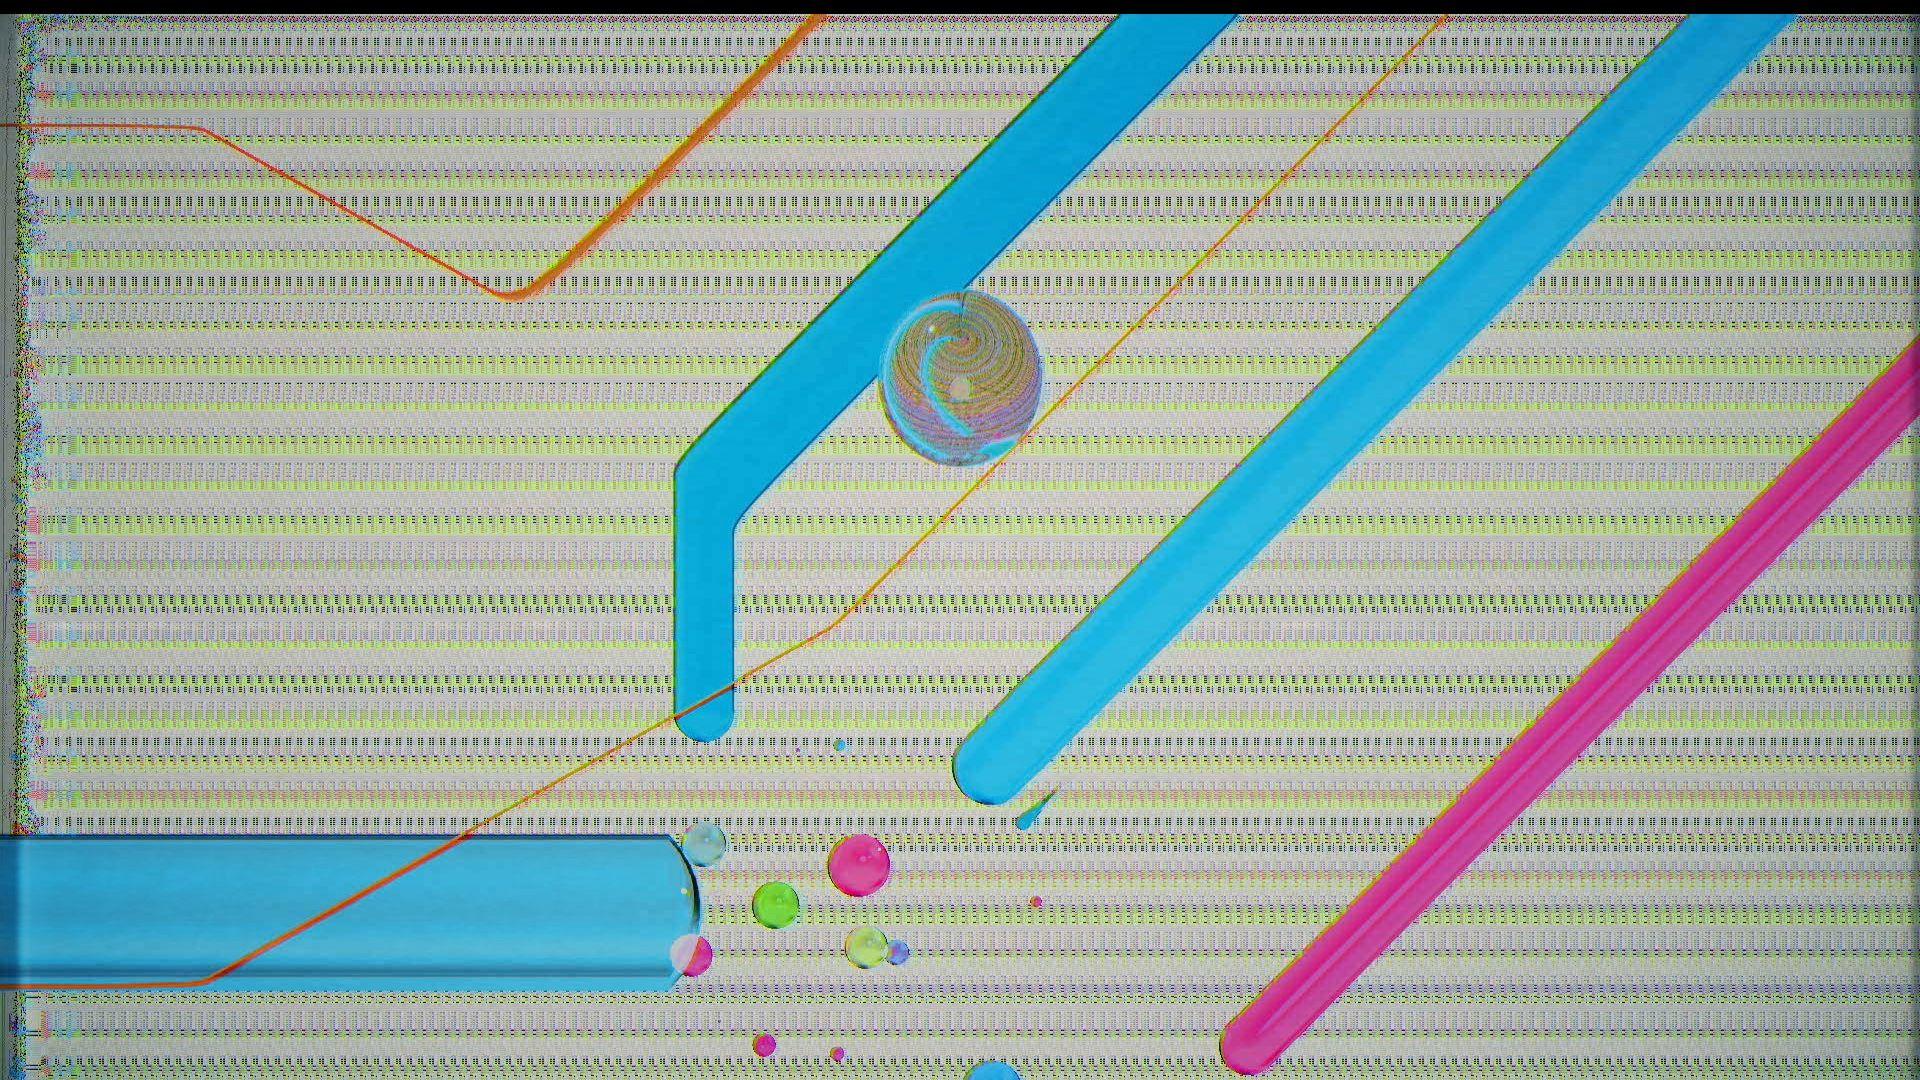 Yoshi-Sodeoka-Exponential-Functions-#3-16x9-compressor.jpg